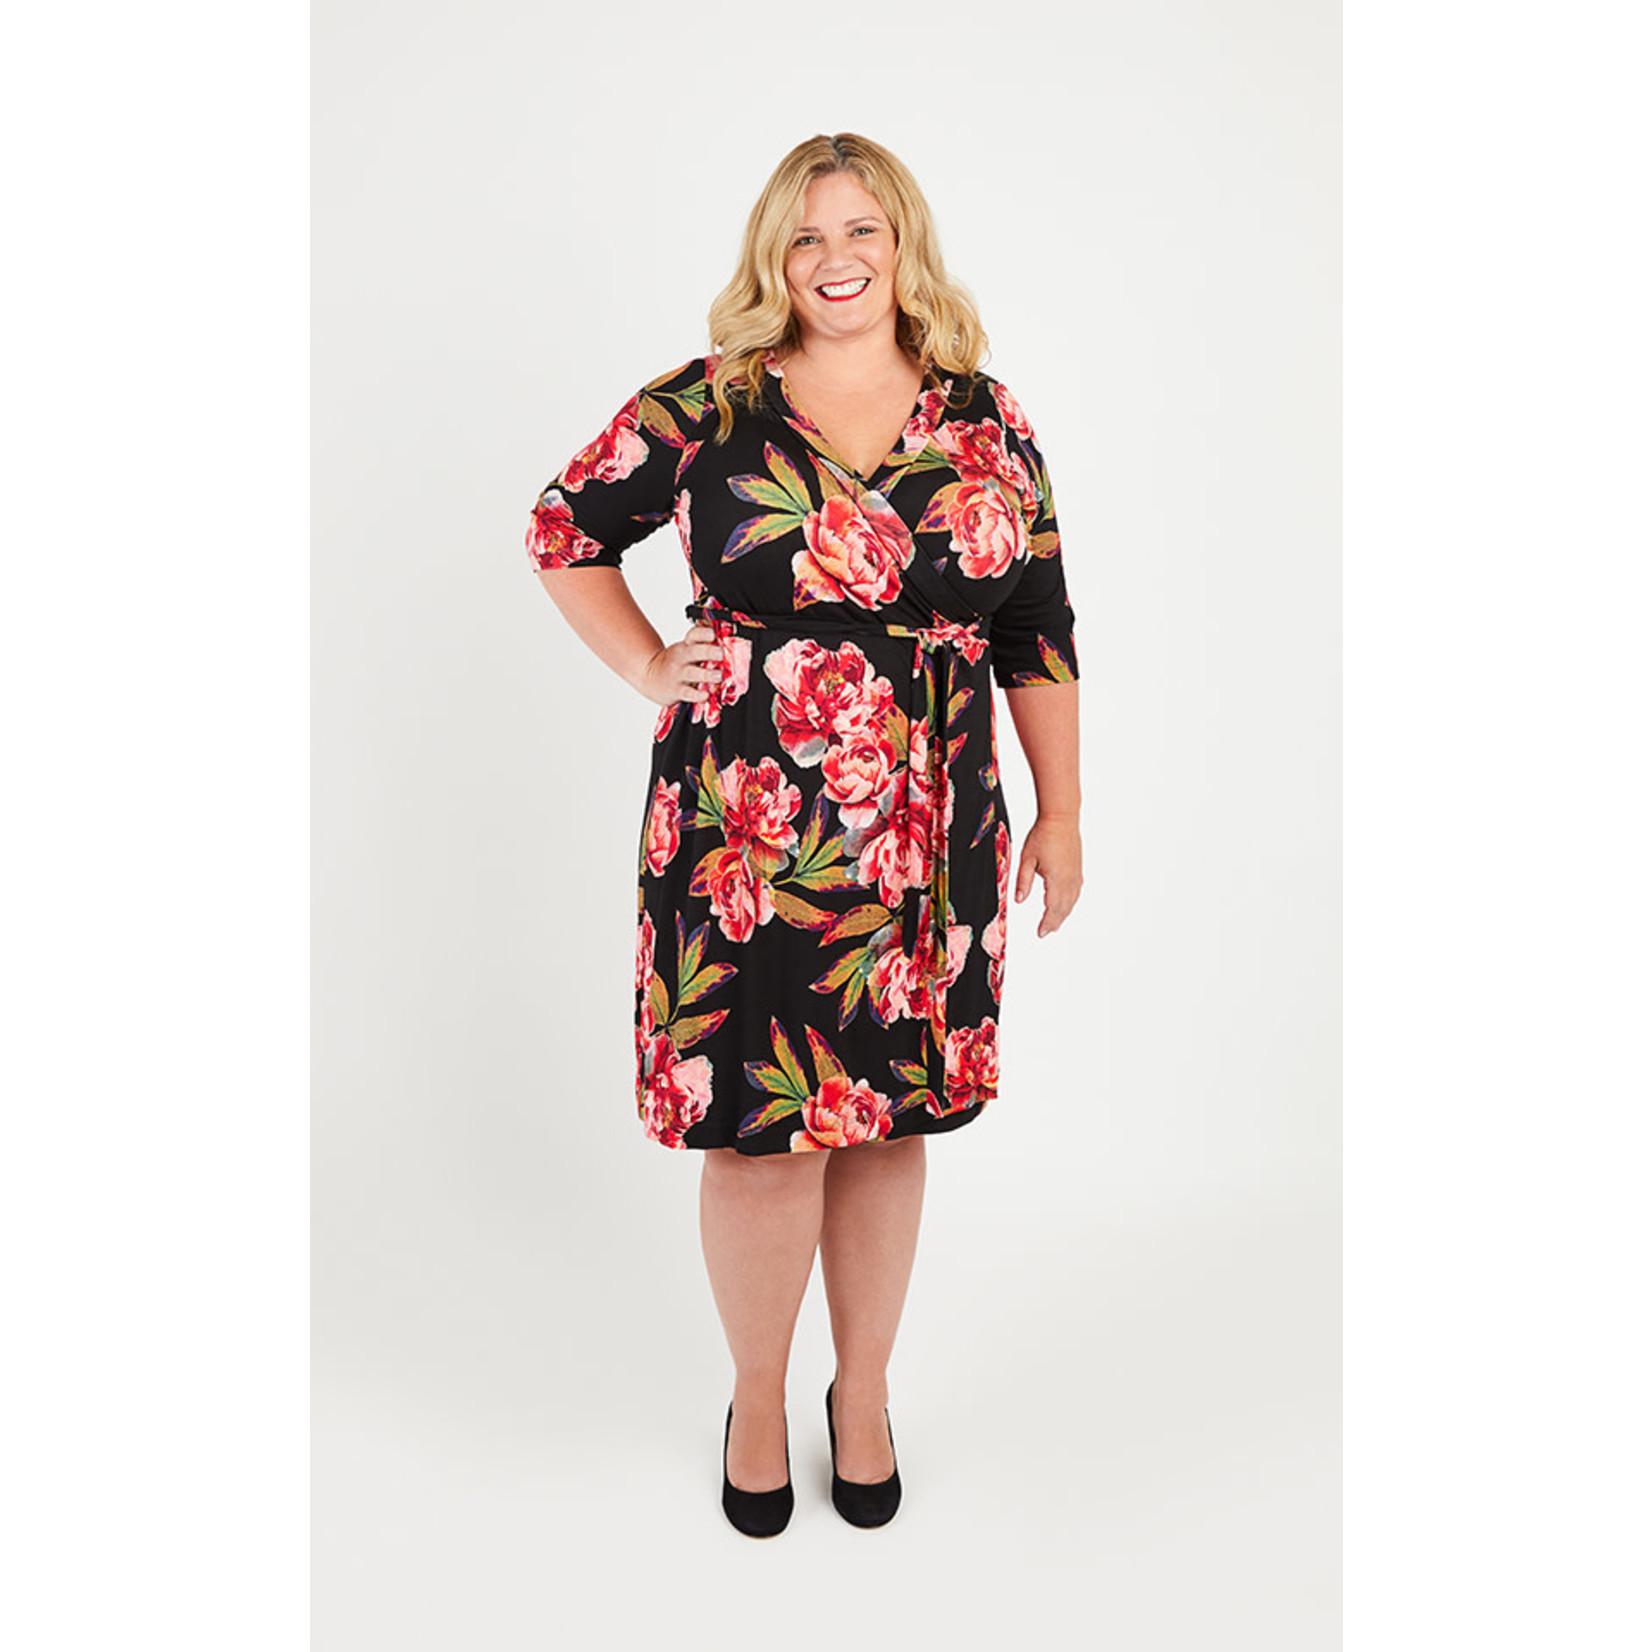 Cashmerette Appleton Dress Pattern 12-28 (Cup C-H)